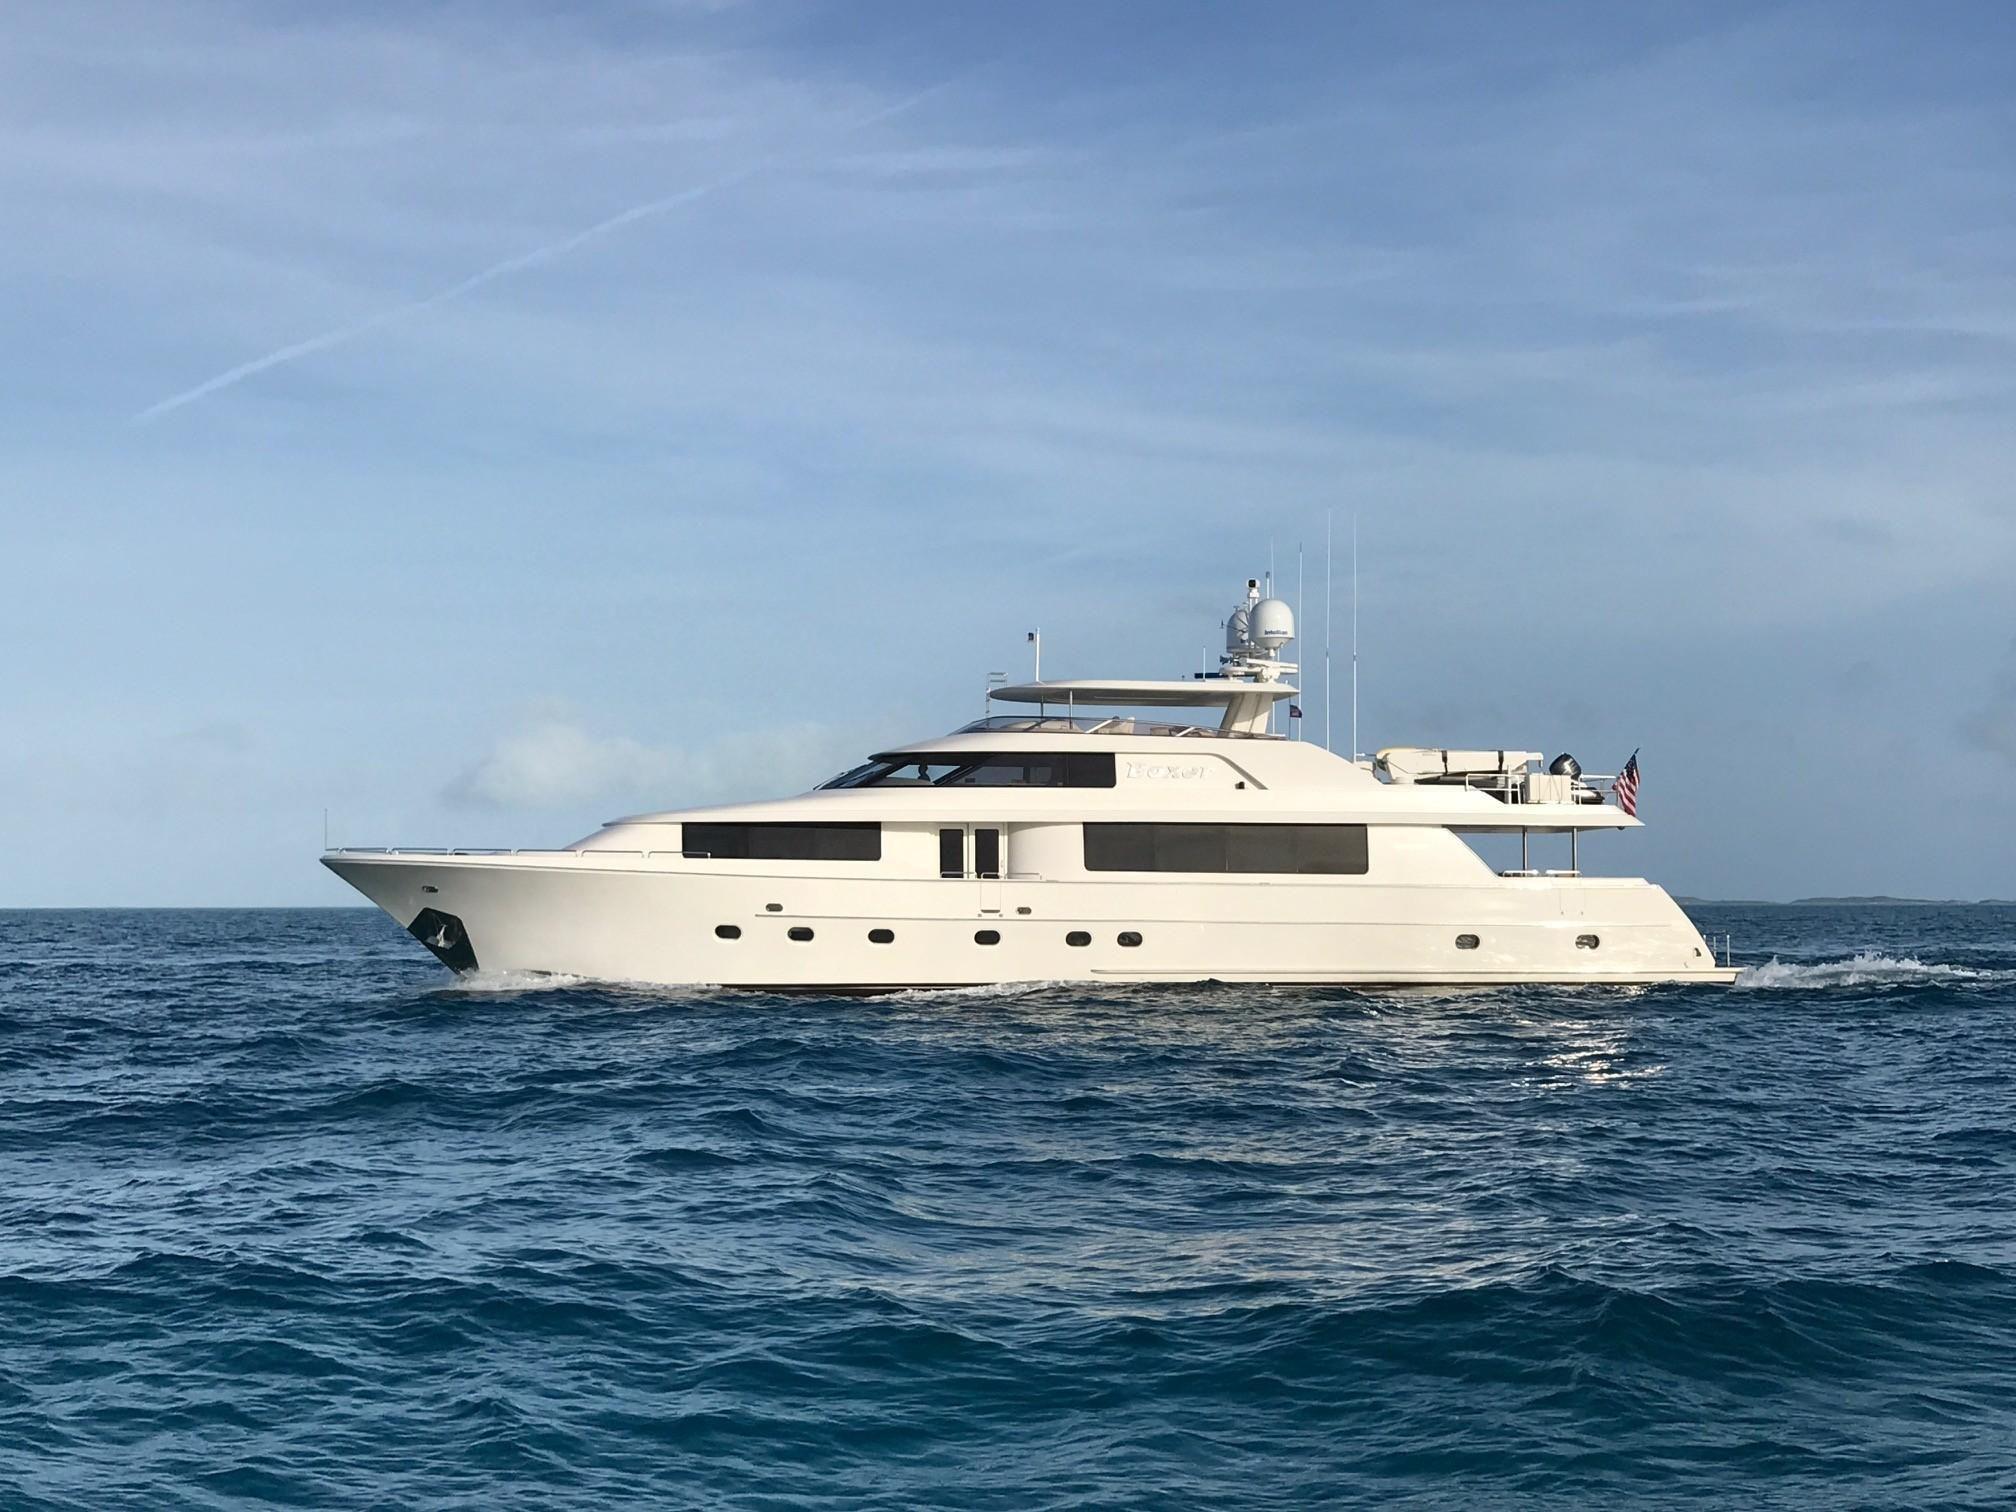 2010 Westport Raised Pilothouse Motoryacht Power Boat For Sale - www ...